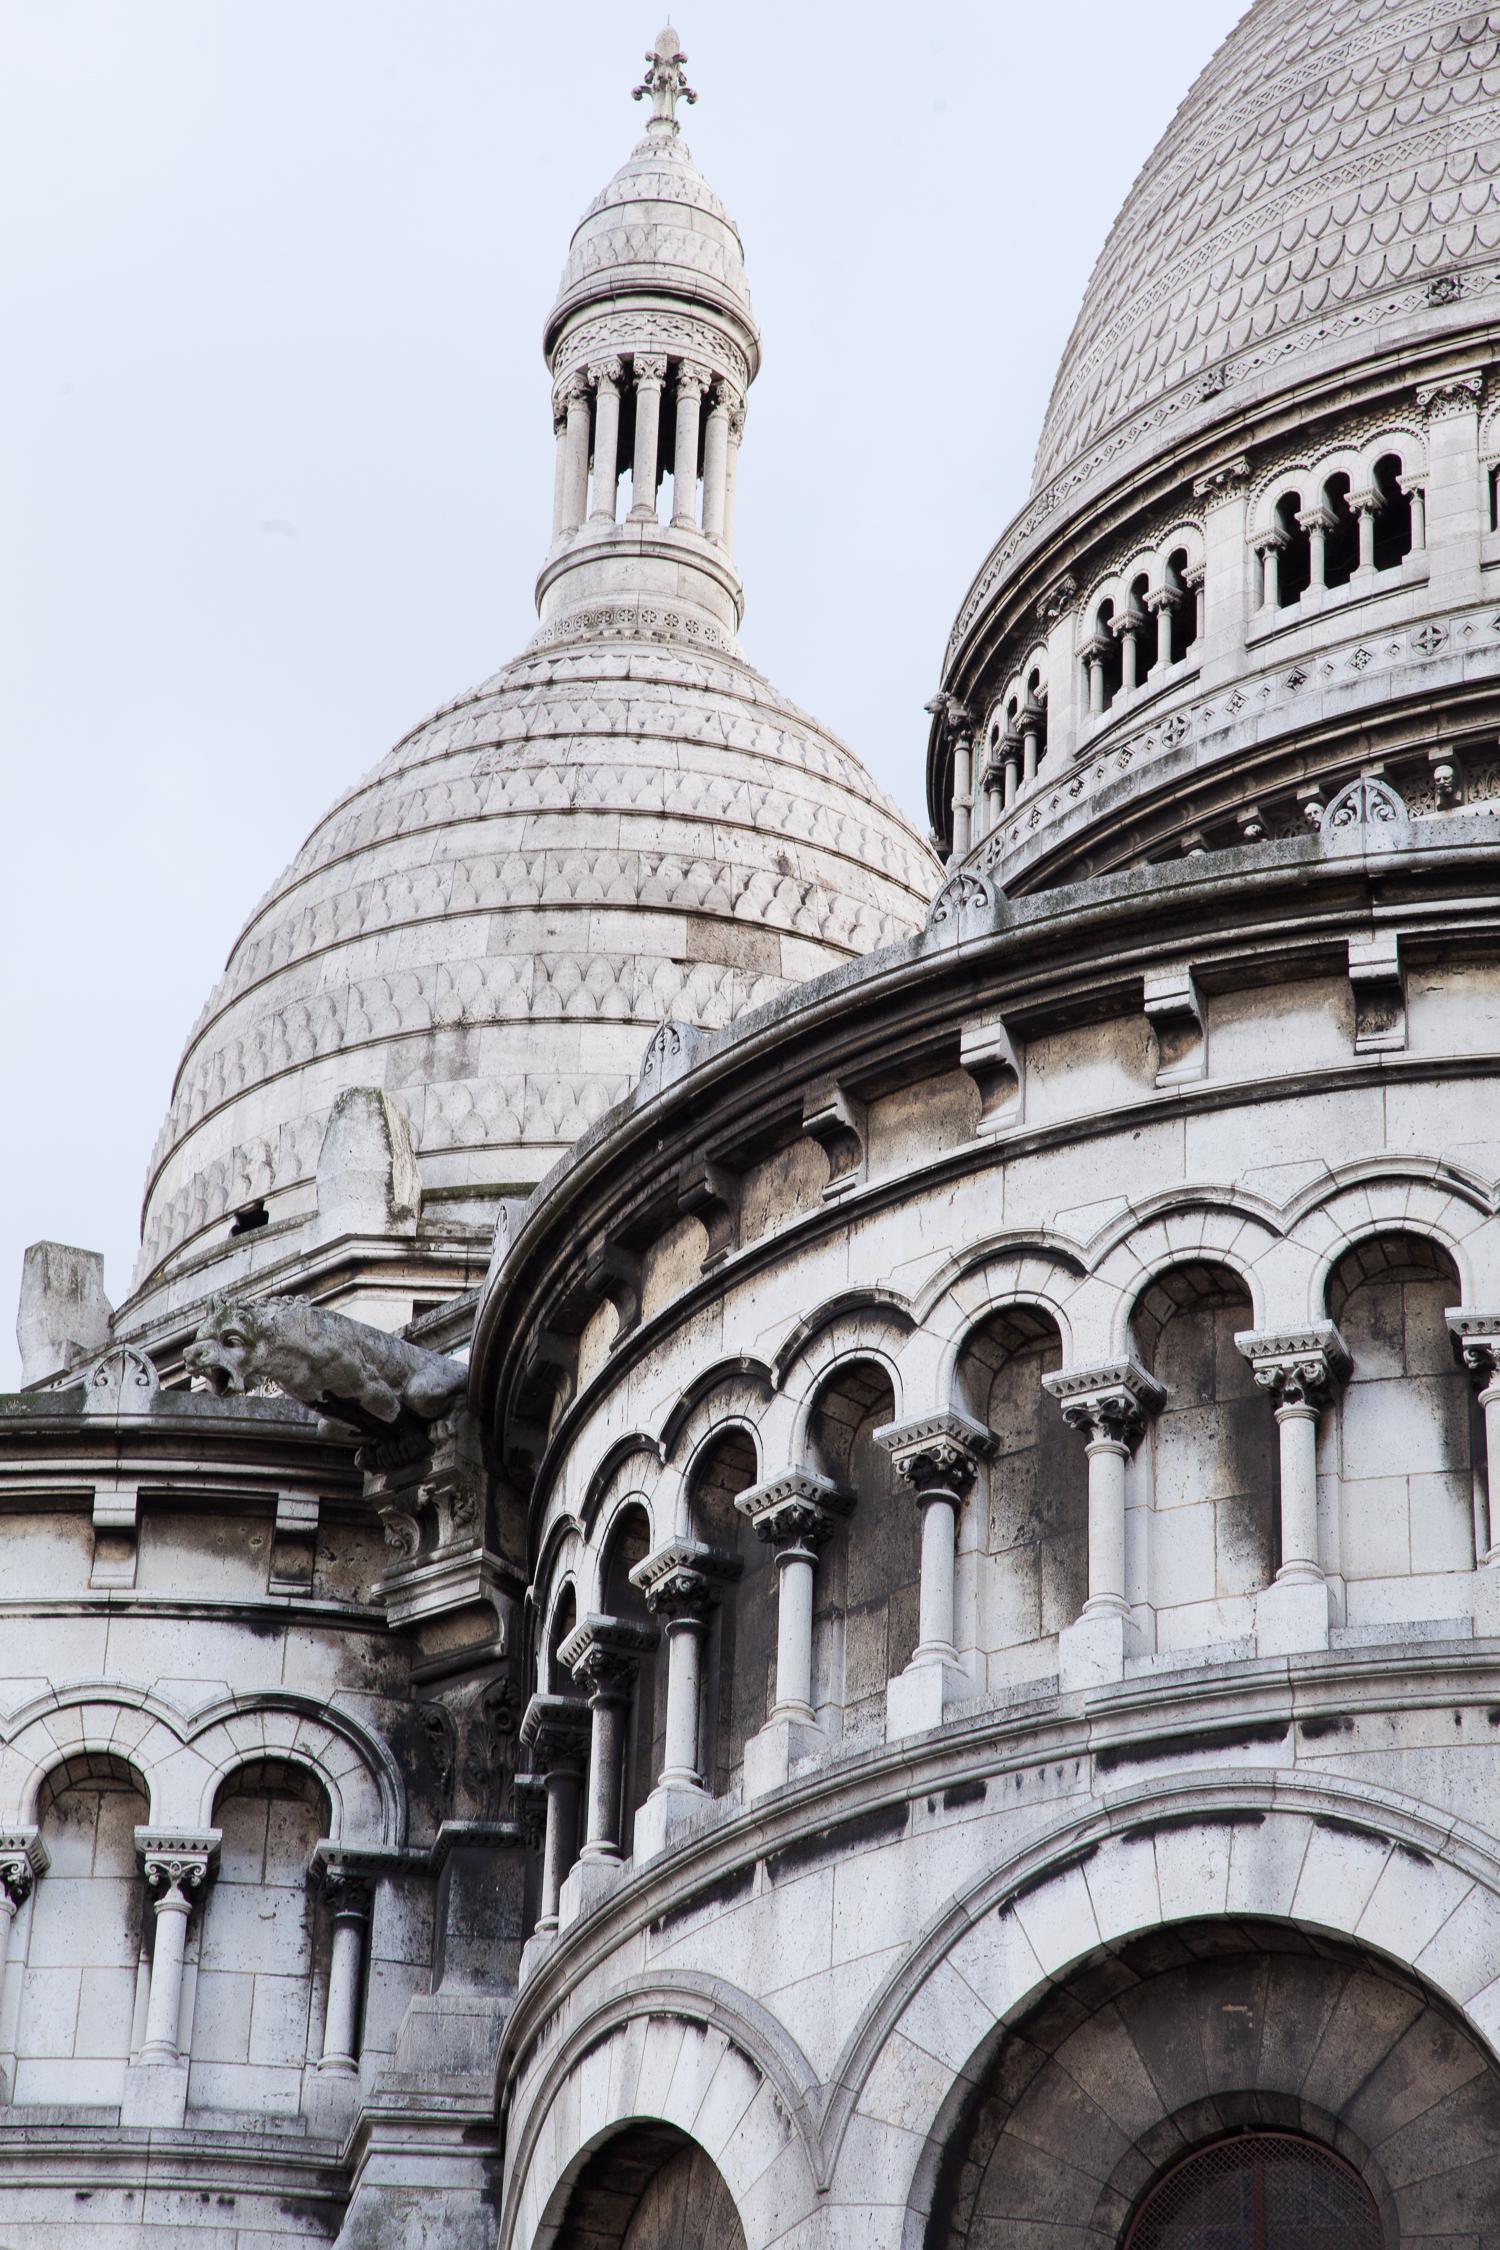 Basilica Sacre Coeur, Montmartre, Paris